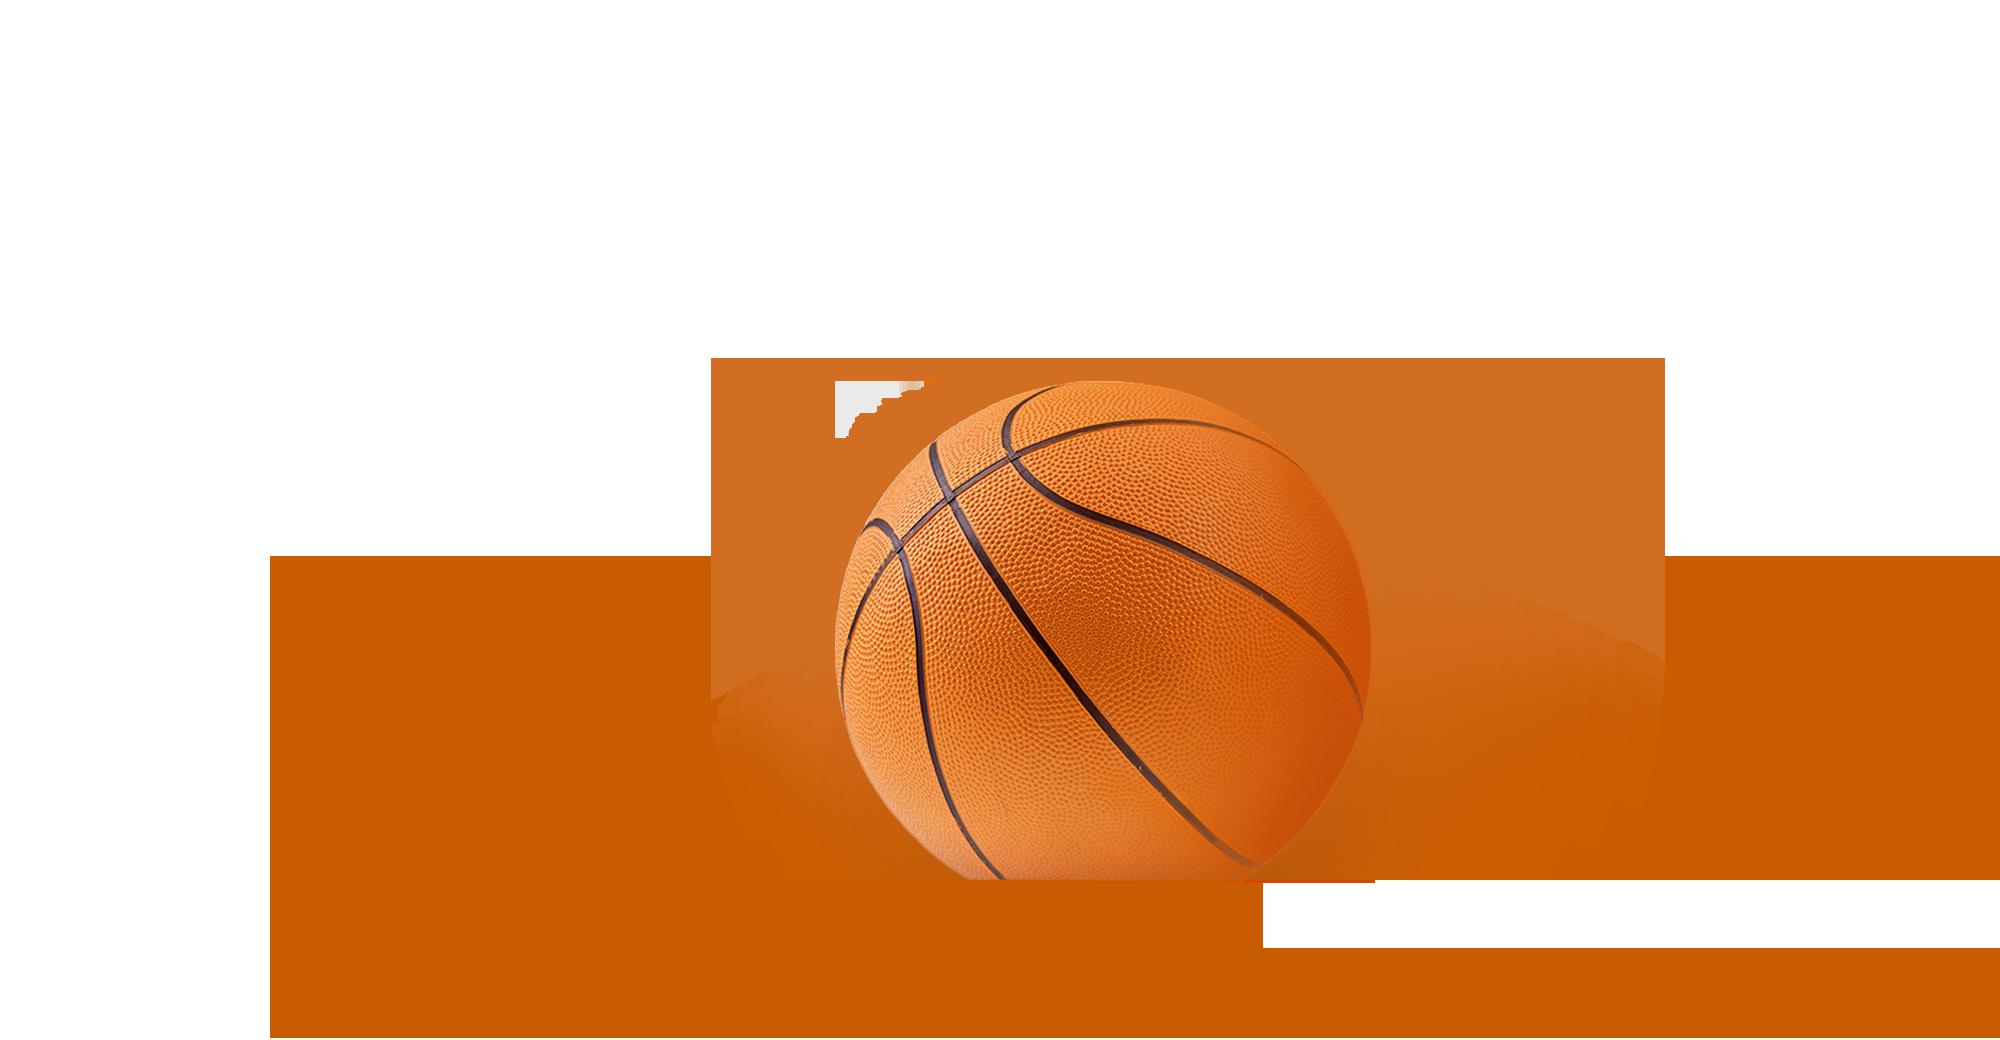 Basketball to represent social sports gaming